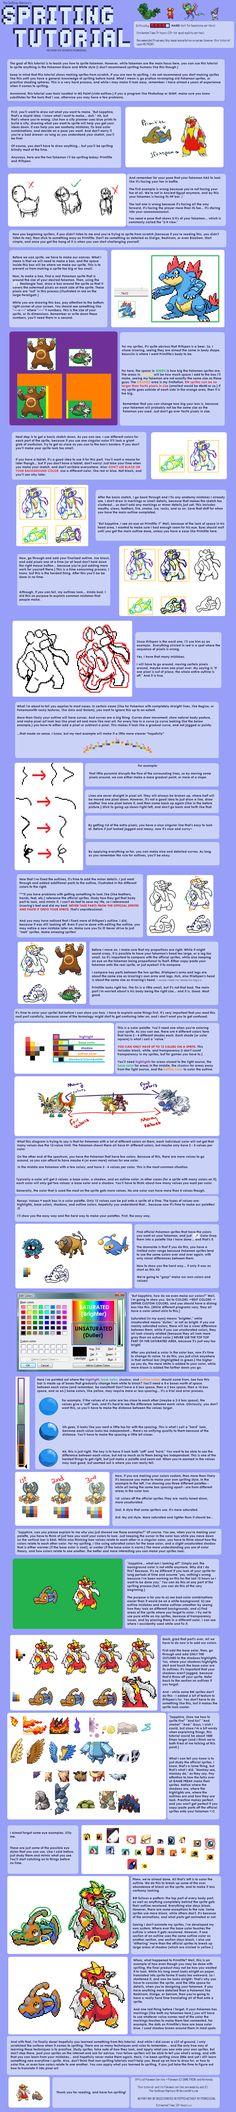 Spriting Fakemon Tutorial V.3 by The-Godlings-Rapture.deviantart.com on @DeviantArt